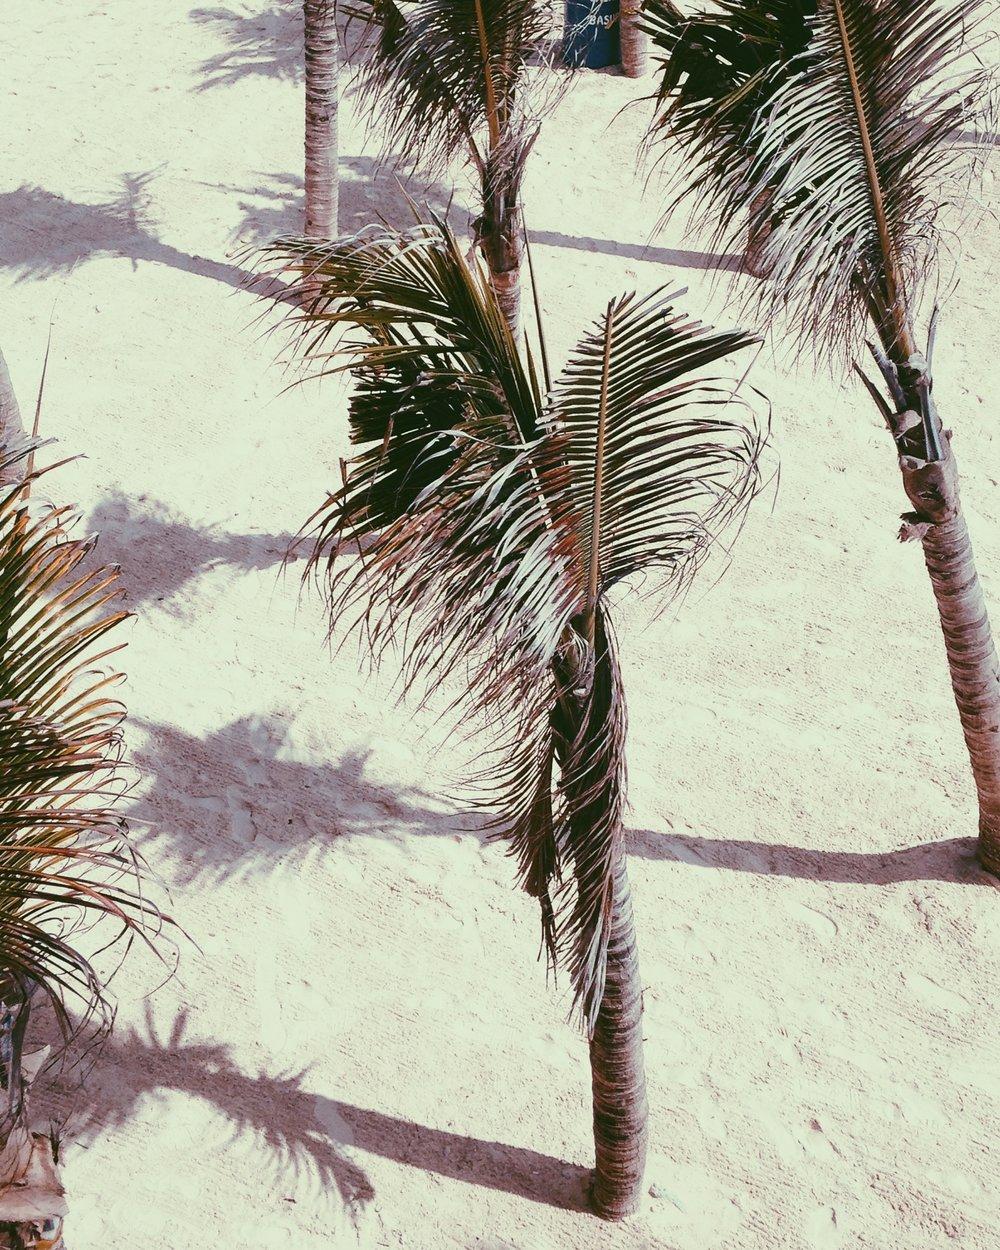 playa del carmen - Mexico Tropical® travel agency